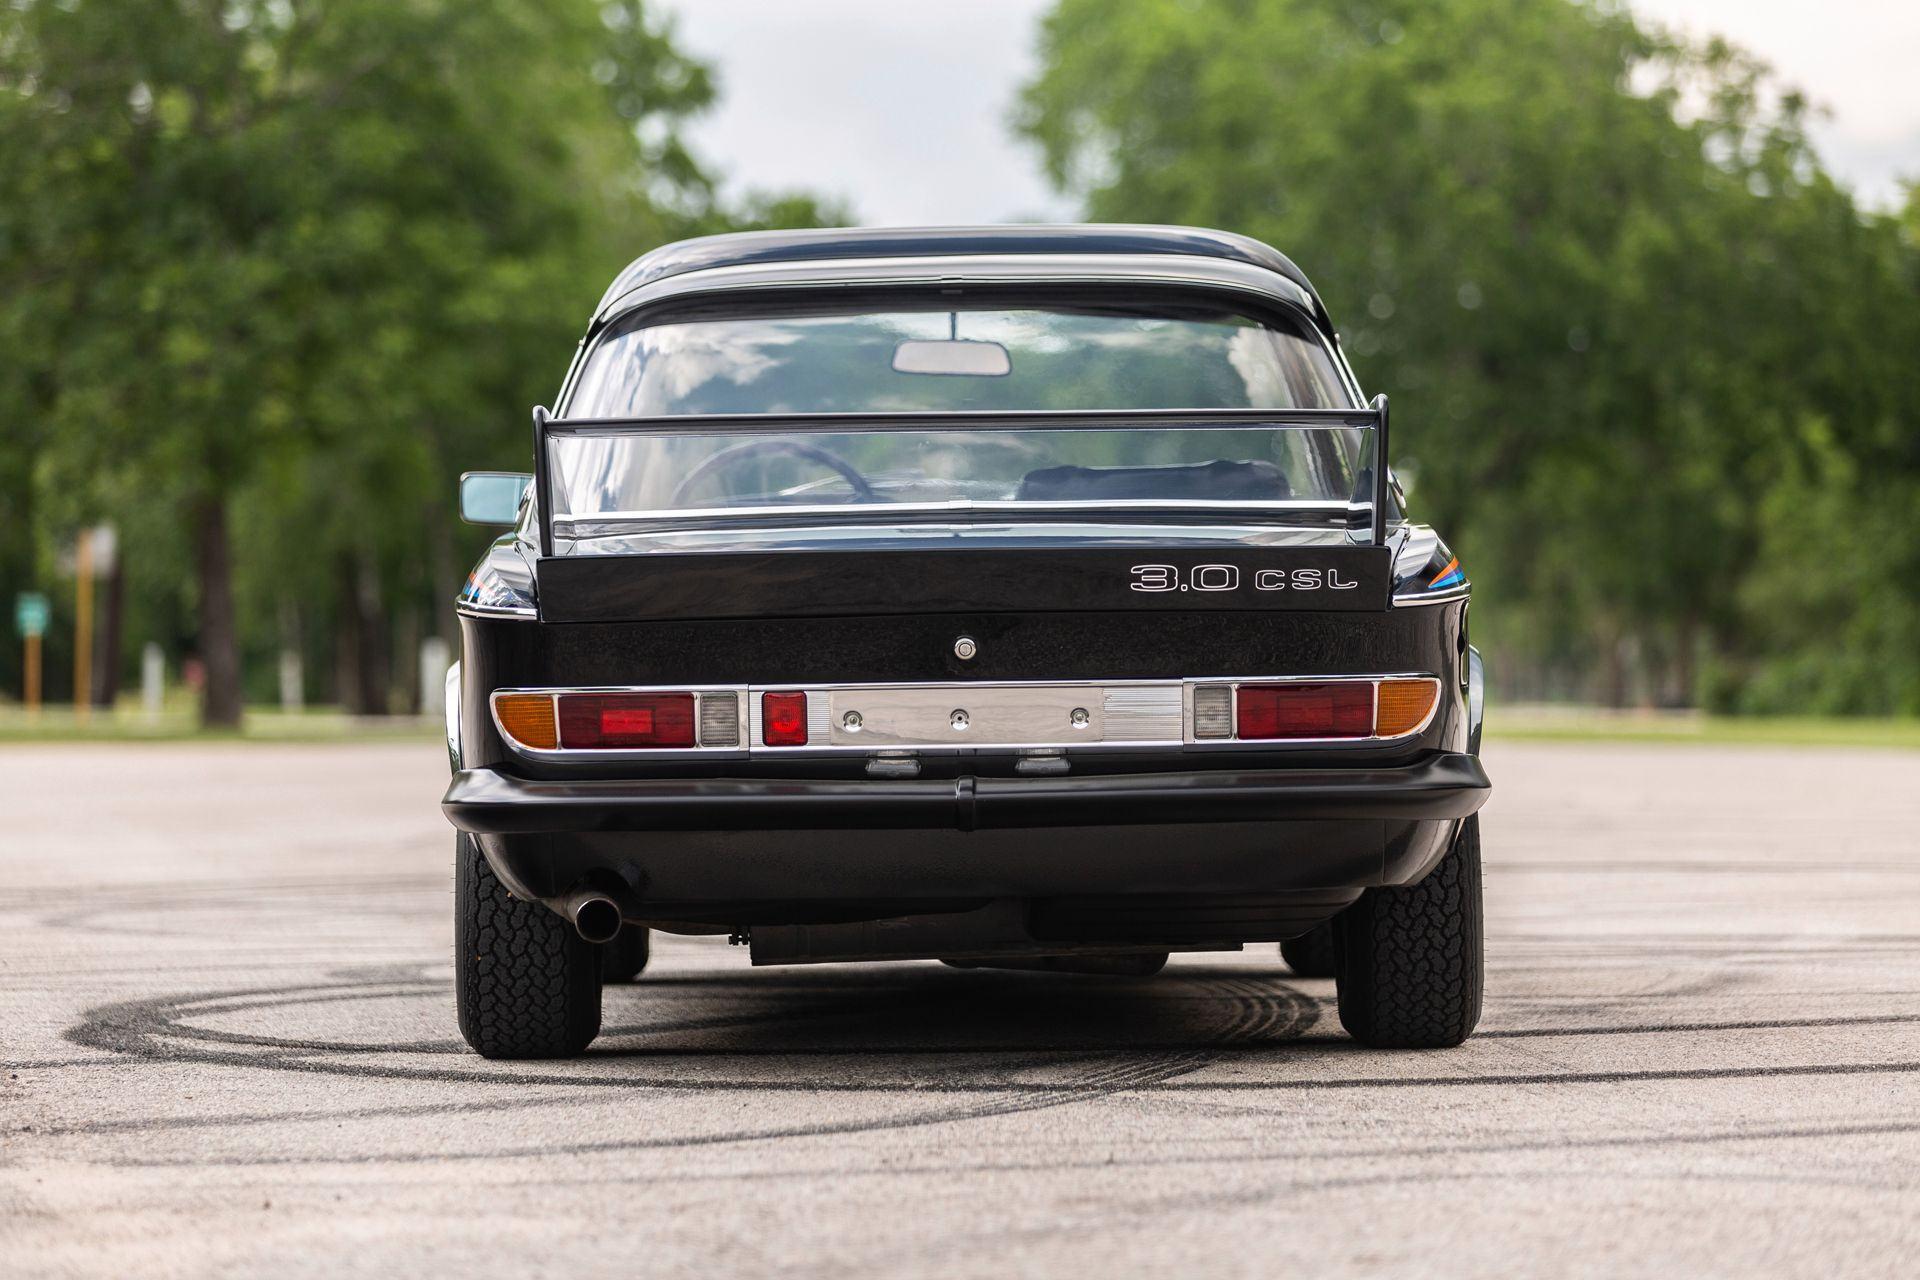 BMW-3.0-CSL-5